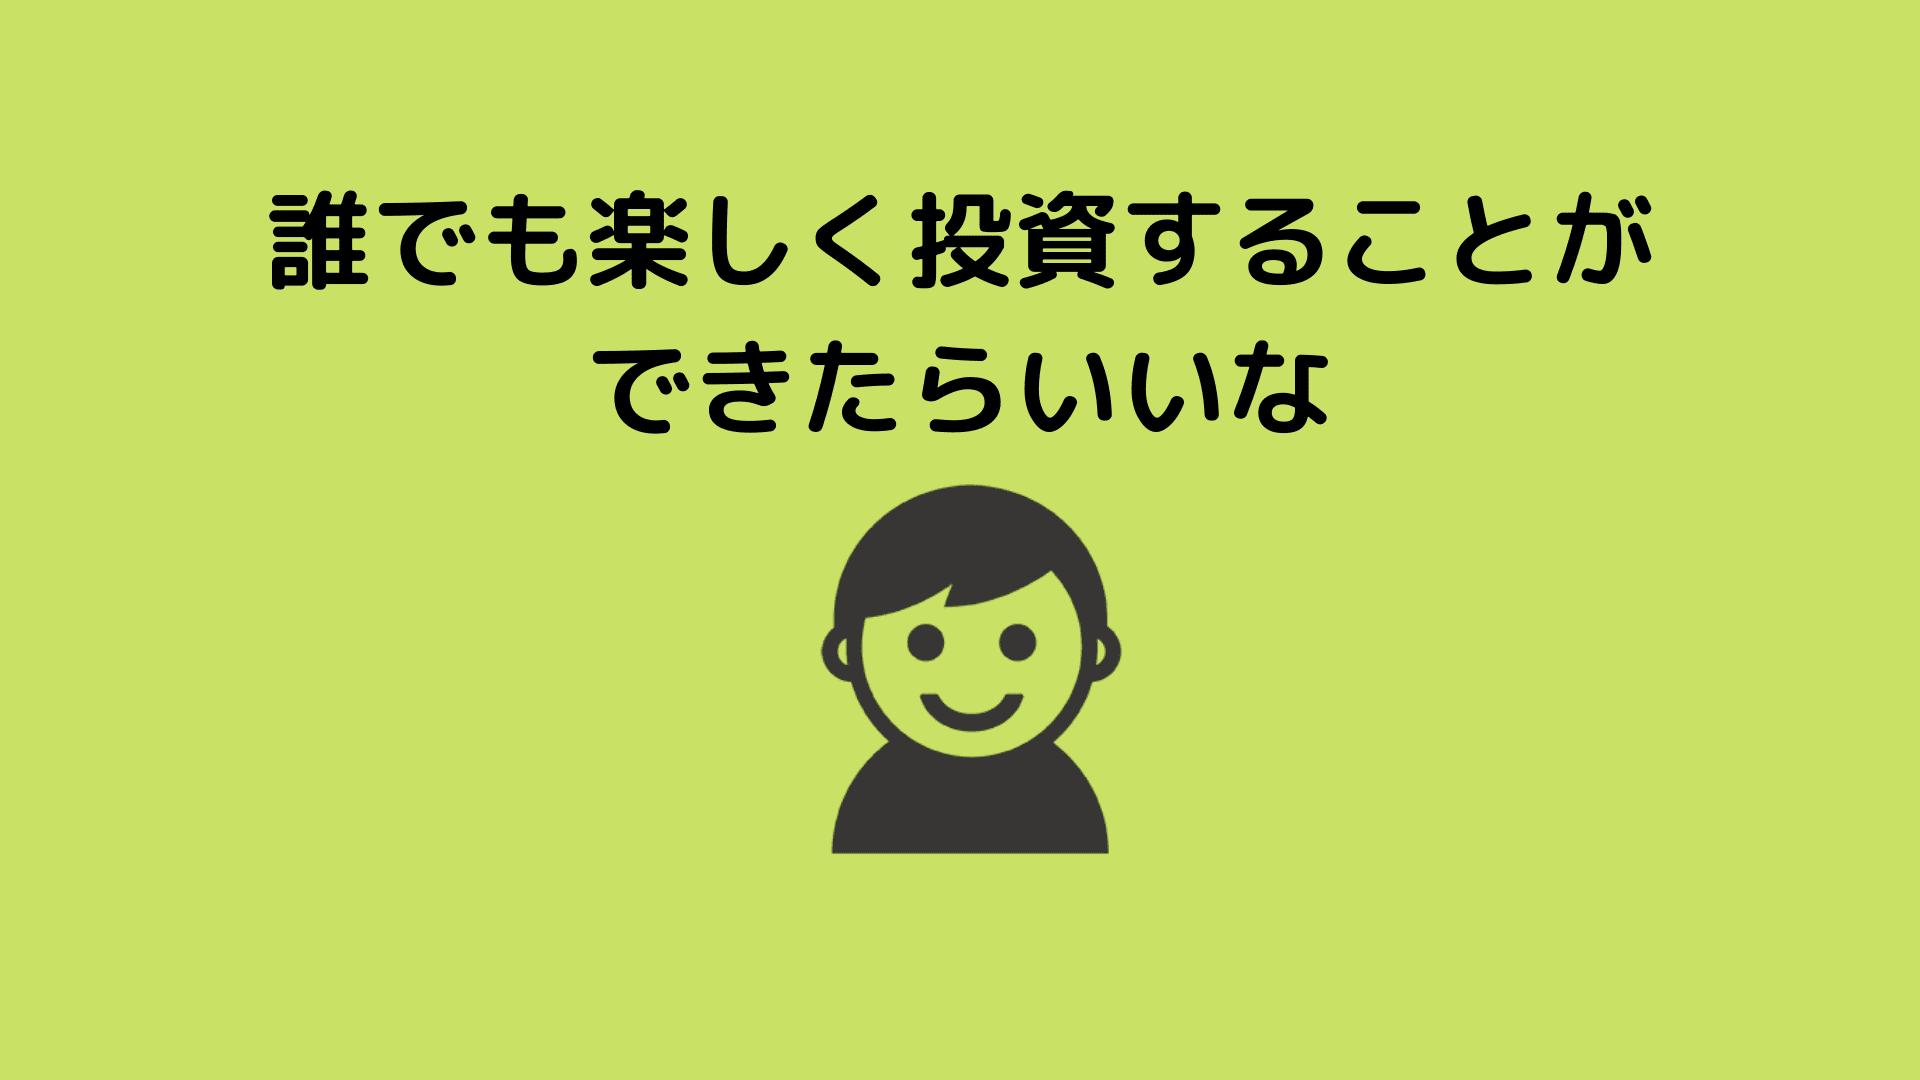 Tanosiku toushi